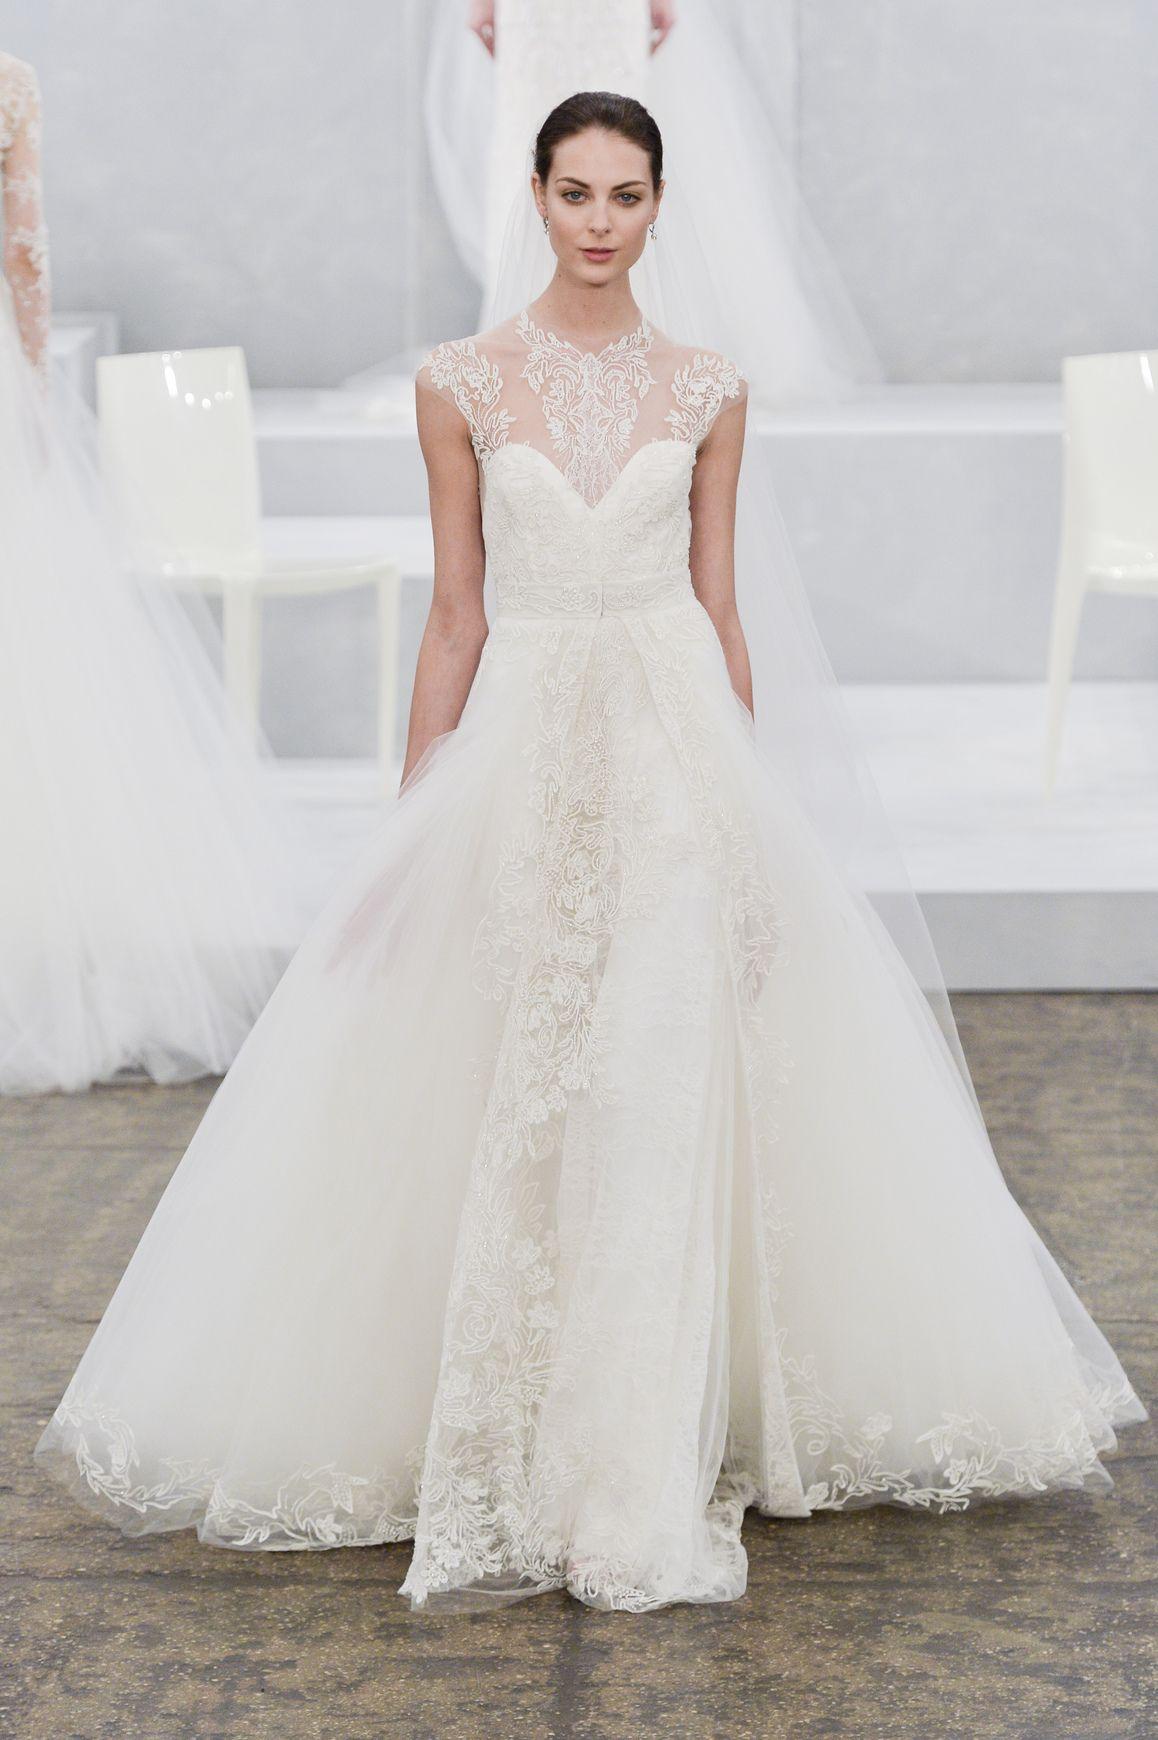 dreamy designer wedding dresses to inspire any bridetobe